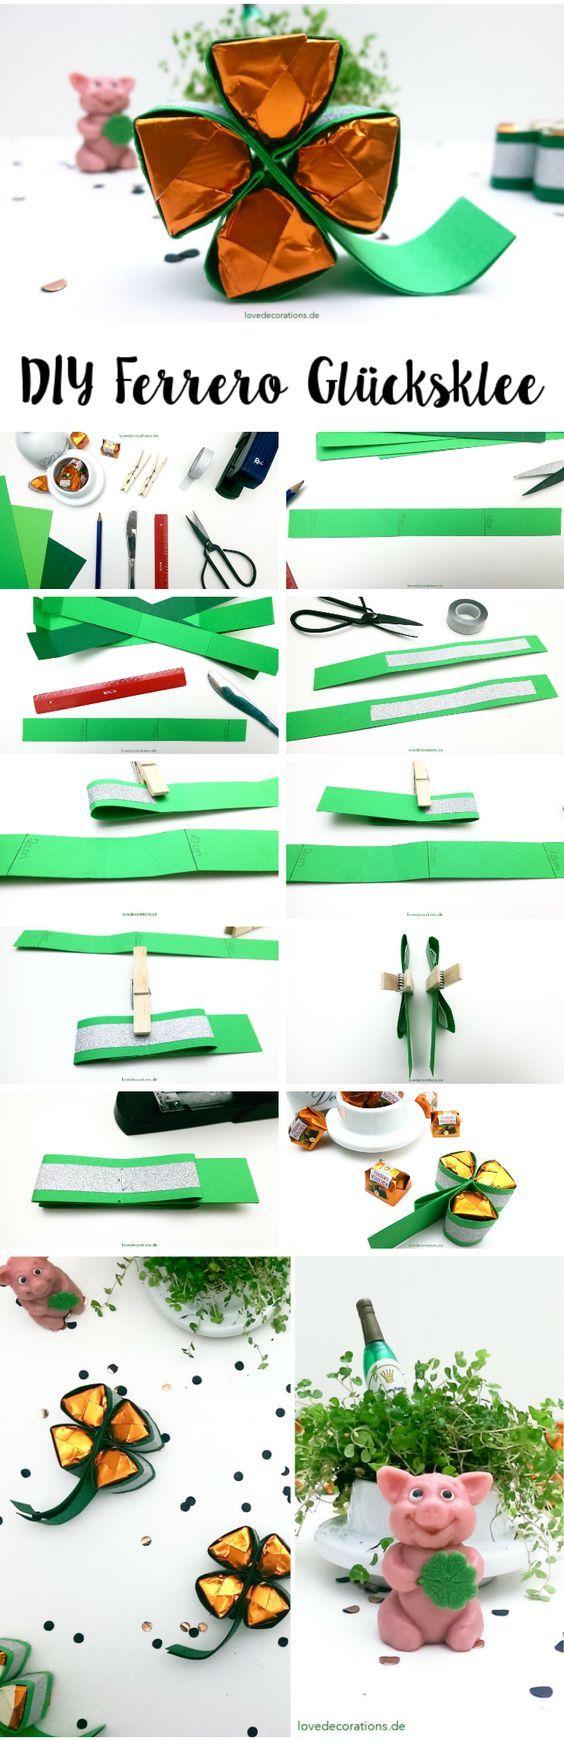 Kleines Silvester-Mitbringsel: Ferrero-Küsschen Kleeblatt - Love Decorations